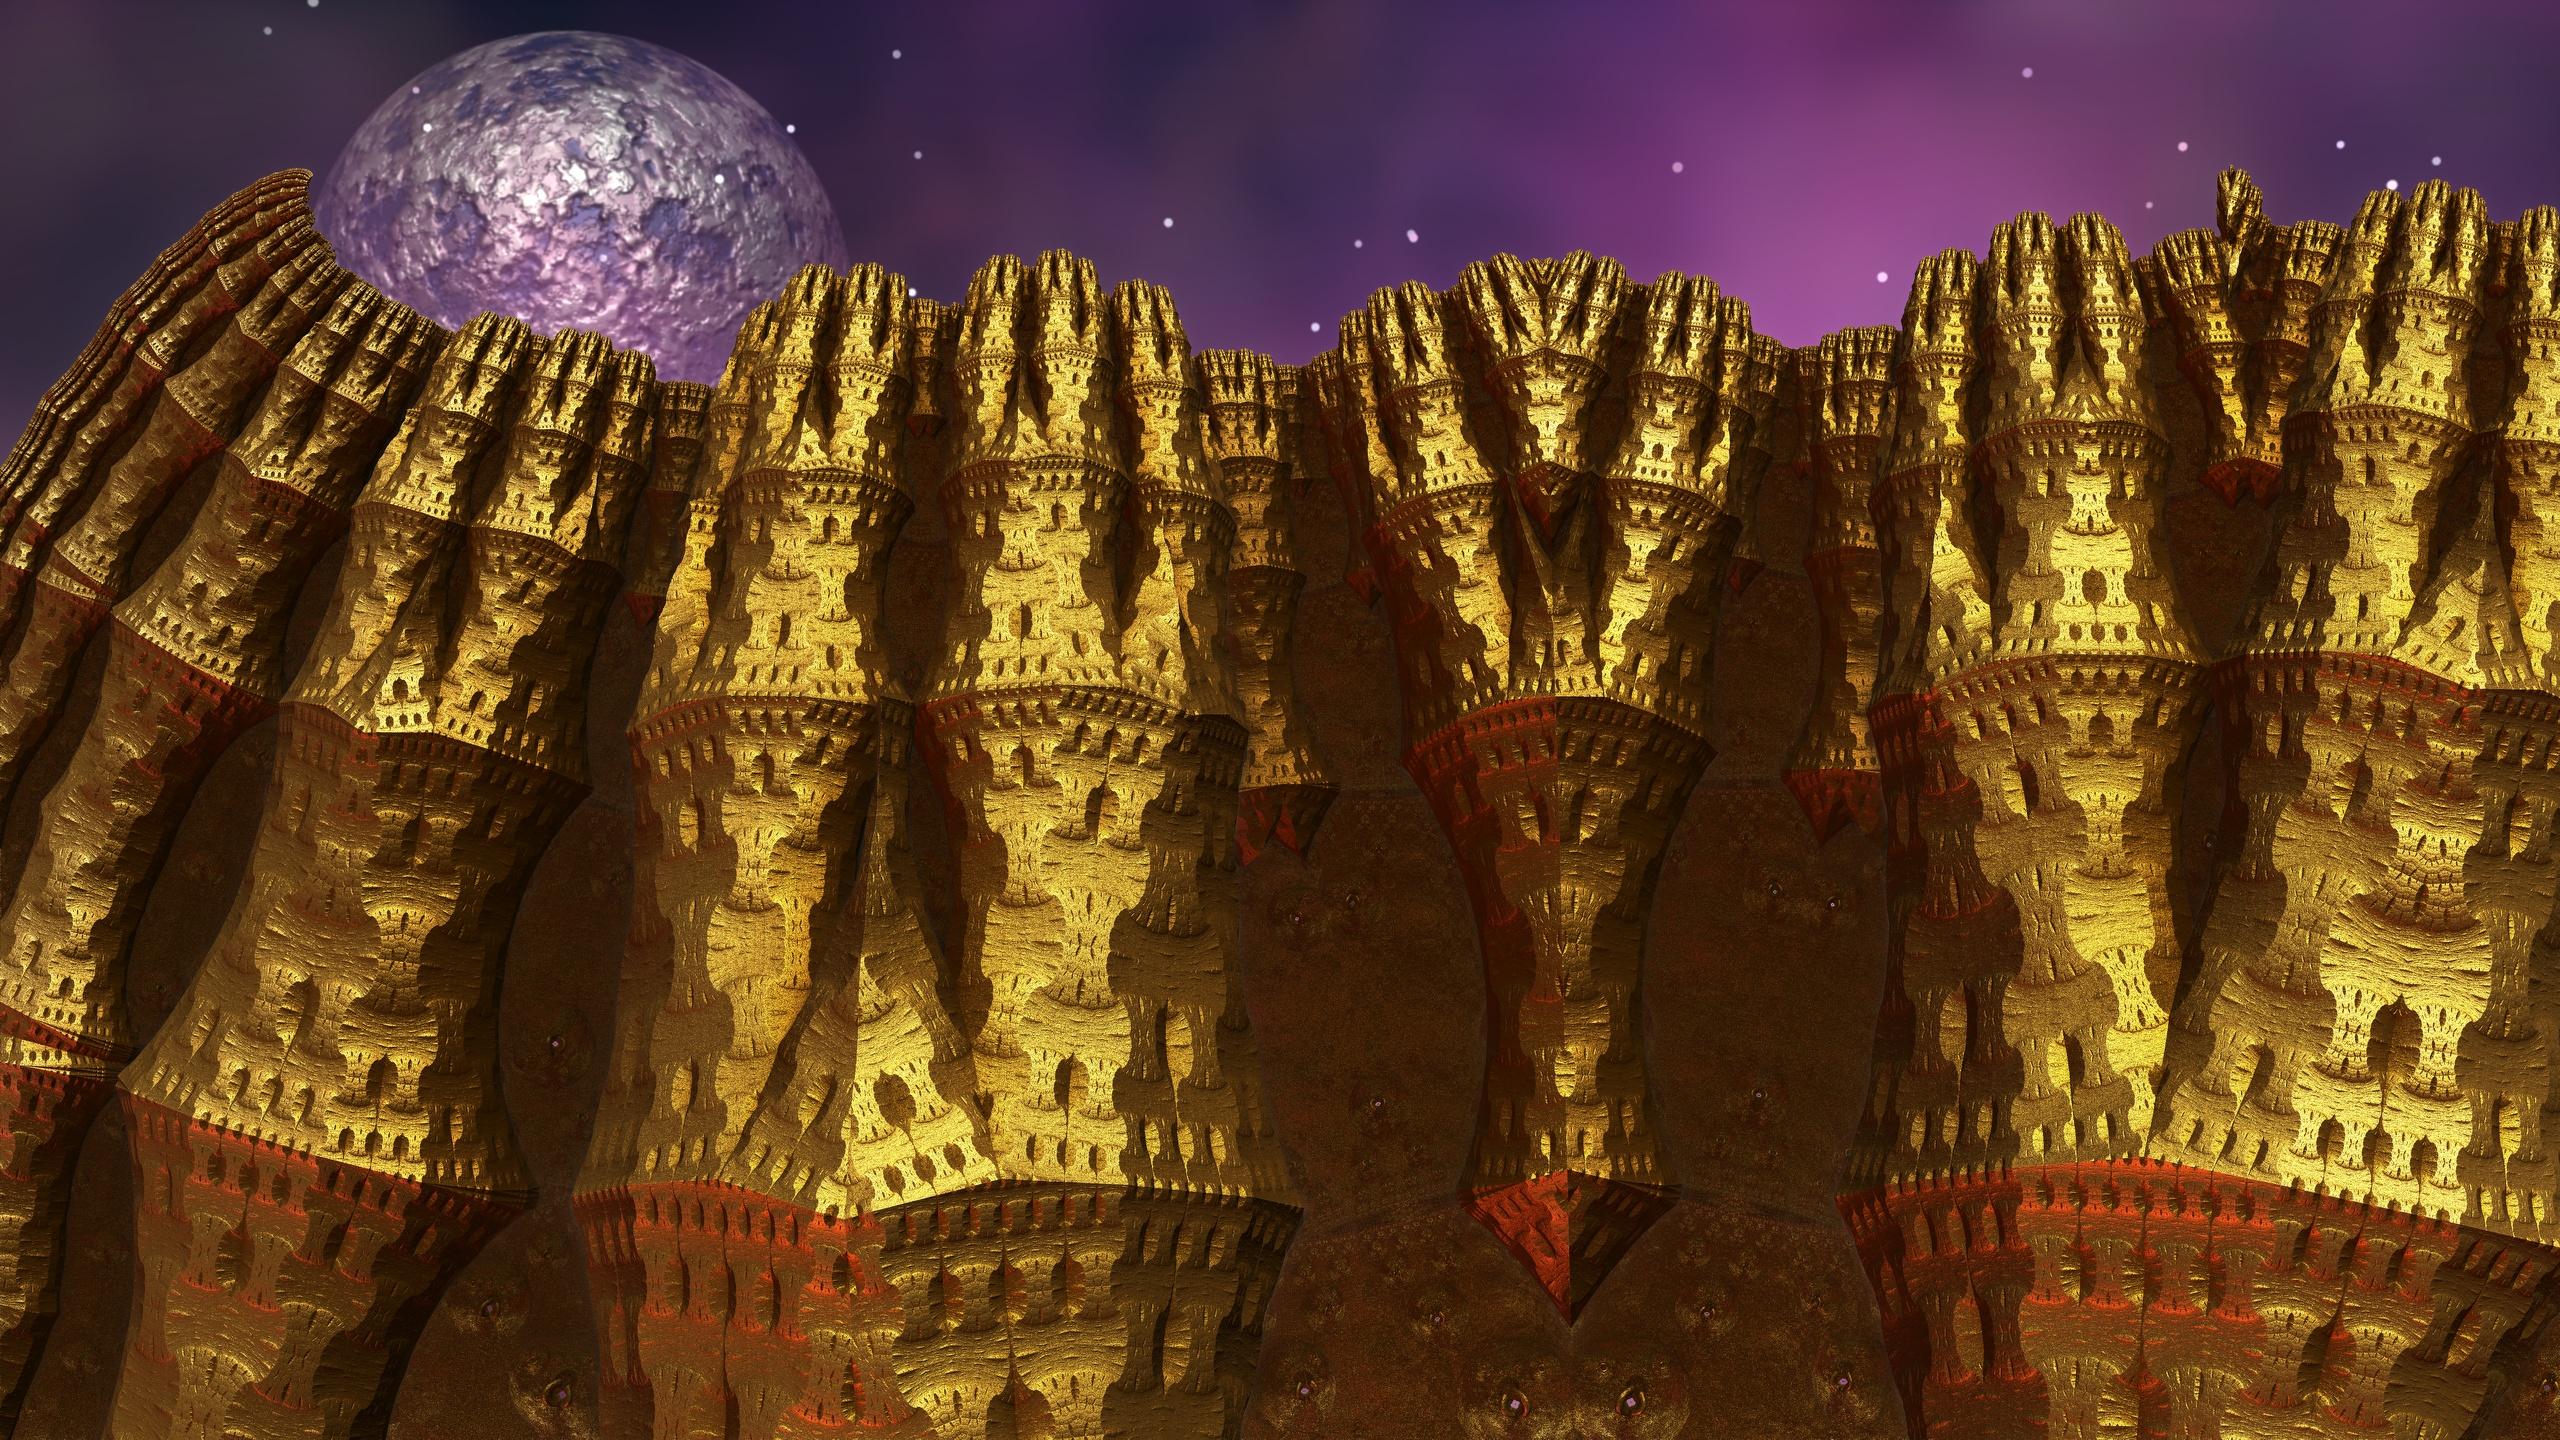 Eternal Golden Castle by Topas2012